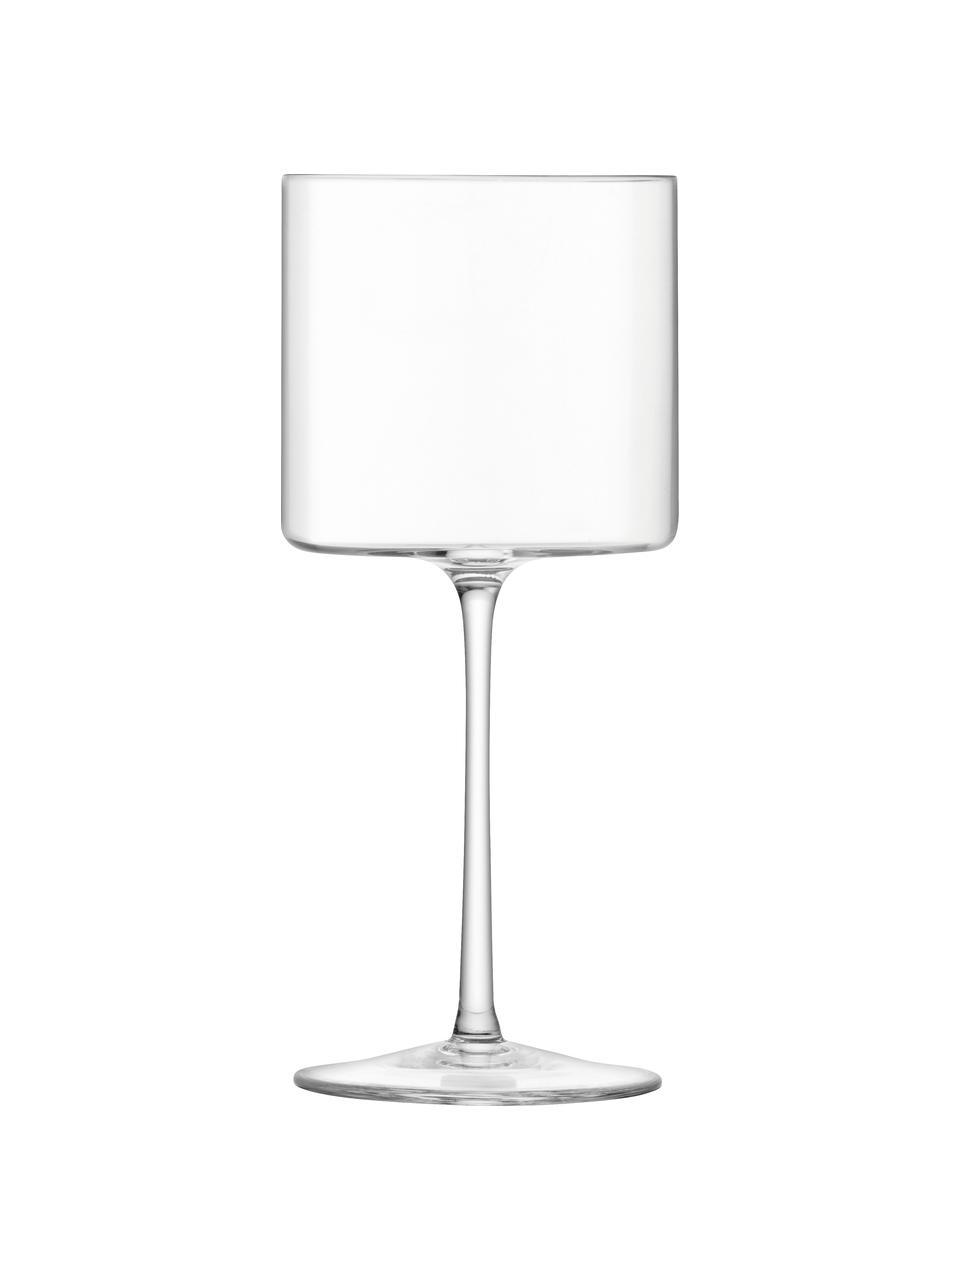 Filigrane Weingläser Otis, 4 Stück, Glas, Transparent, Ø 8 x H 19 cm